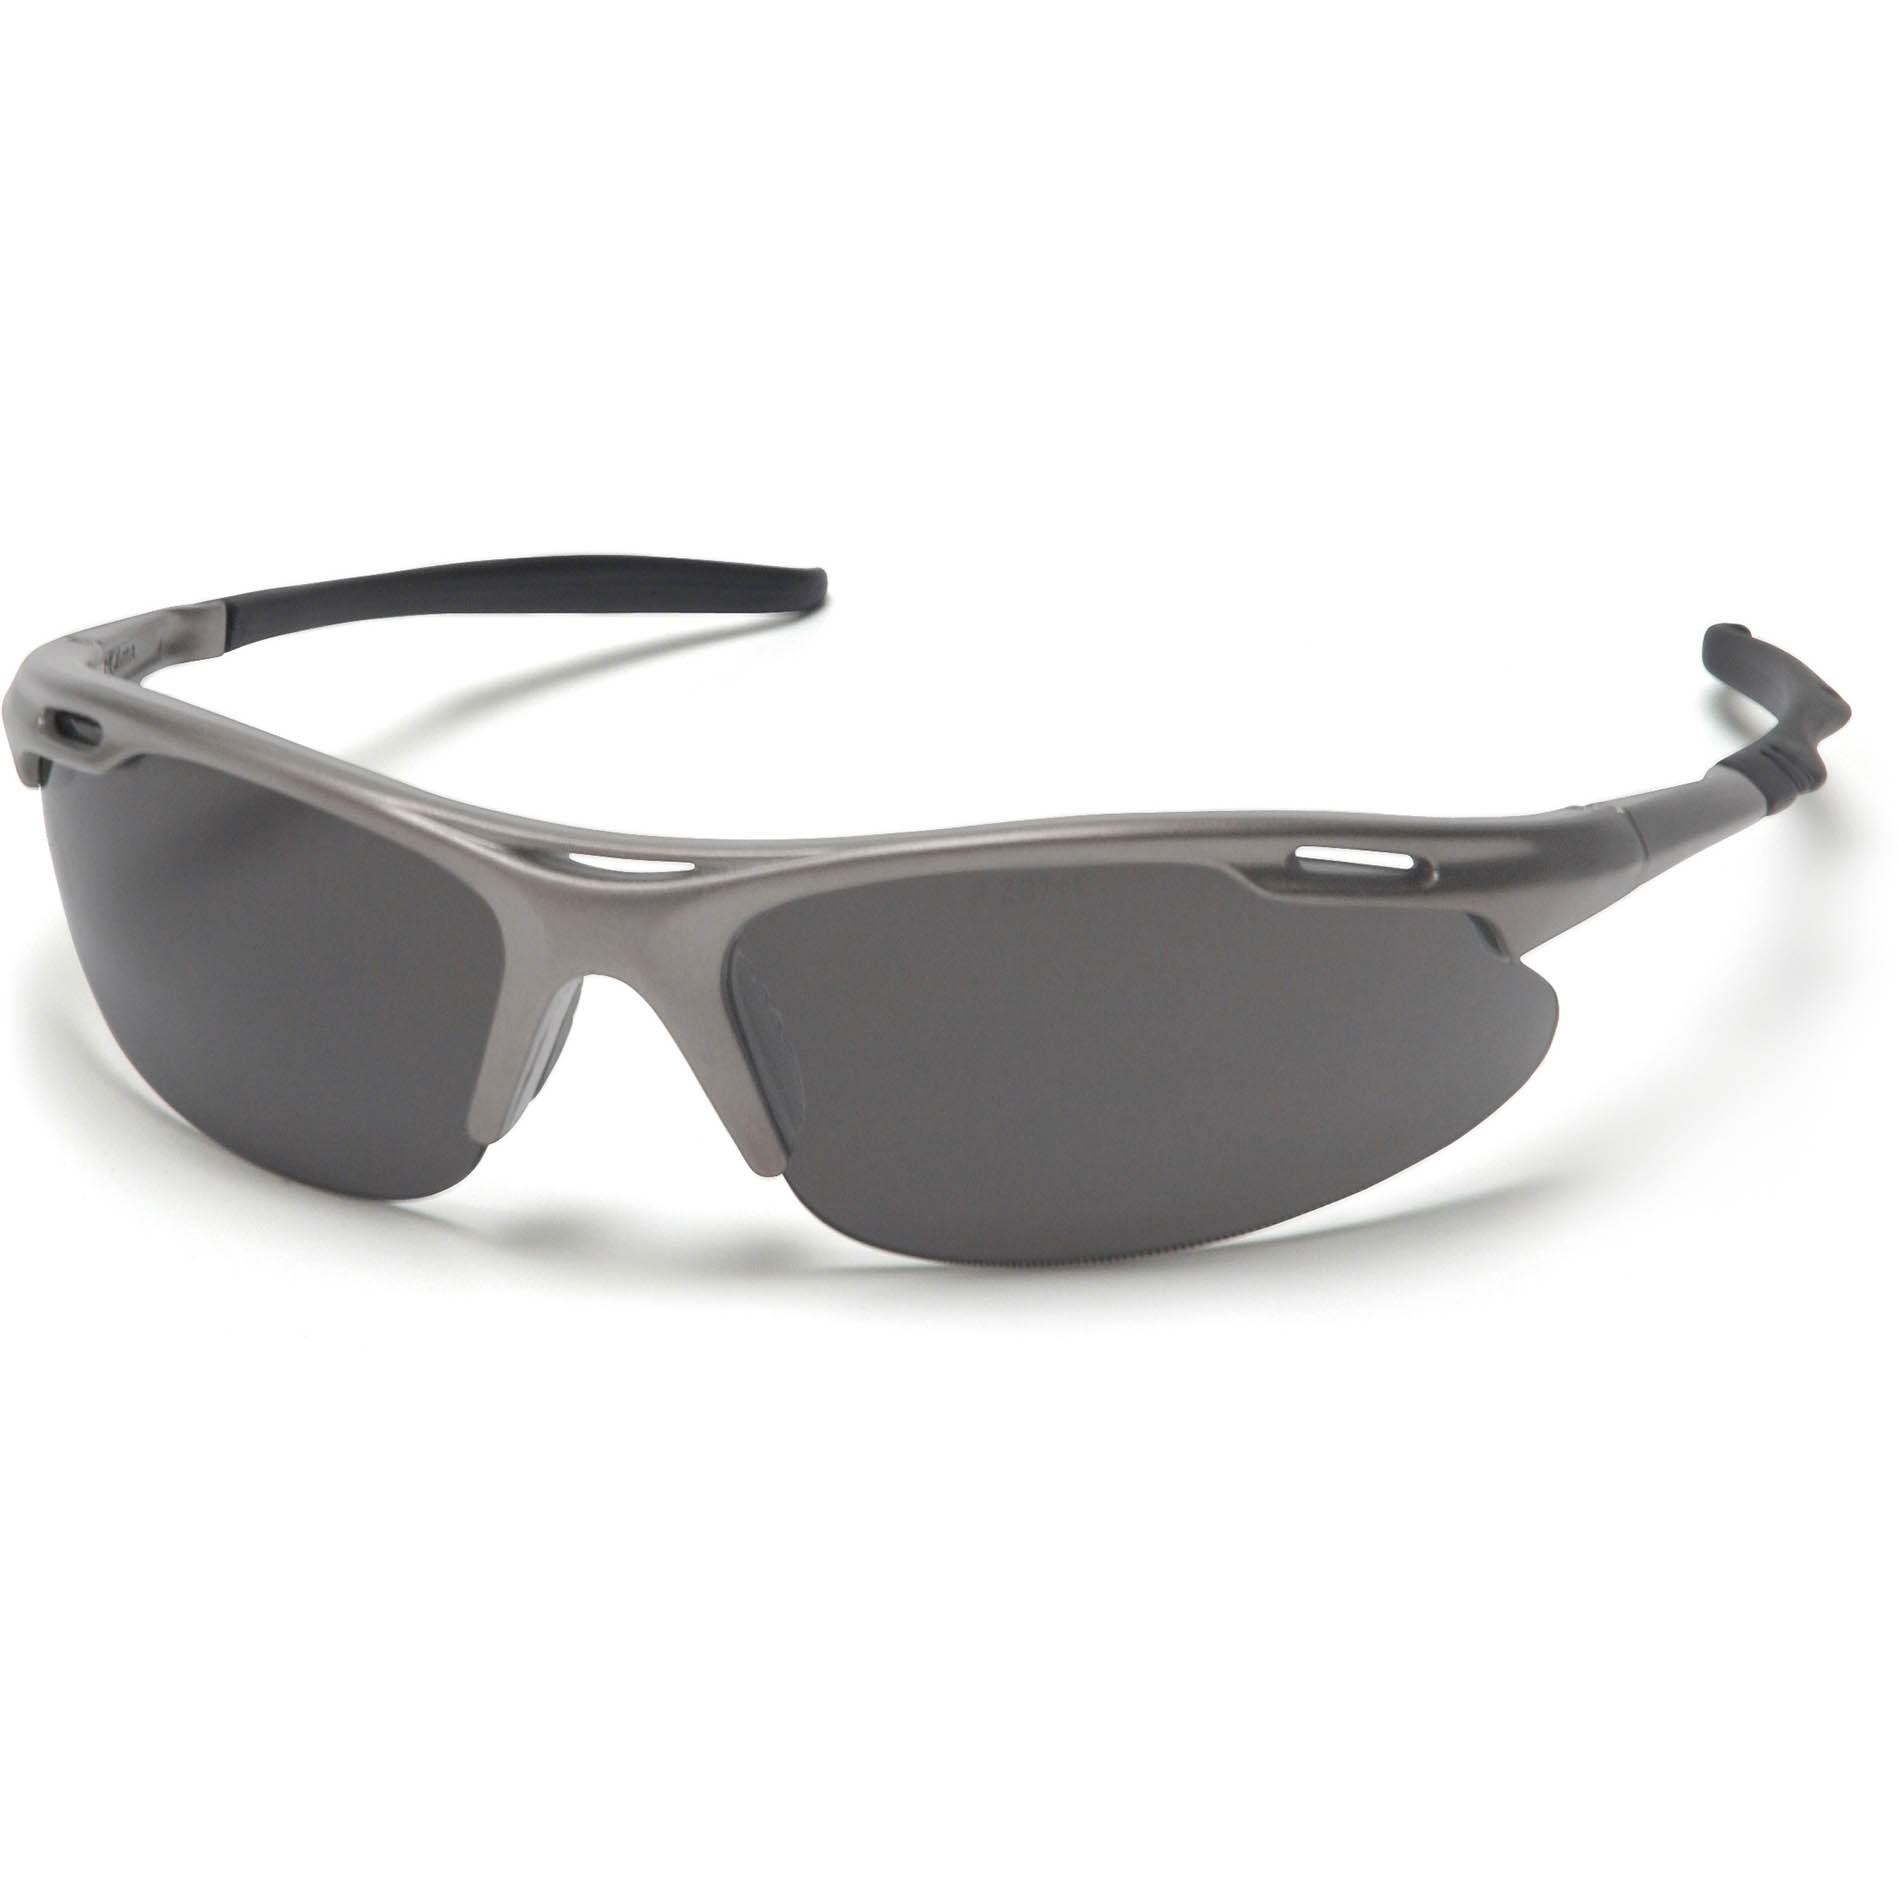 Pyramex® Avante® Safety Glasses, Gunmetal Frame, Gray Lens